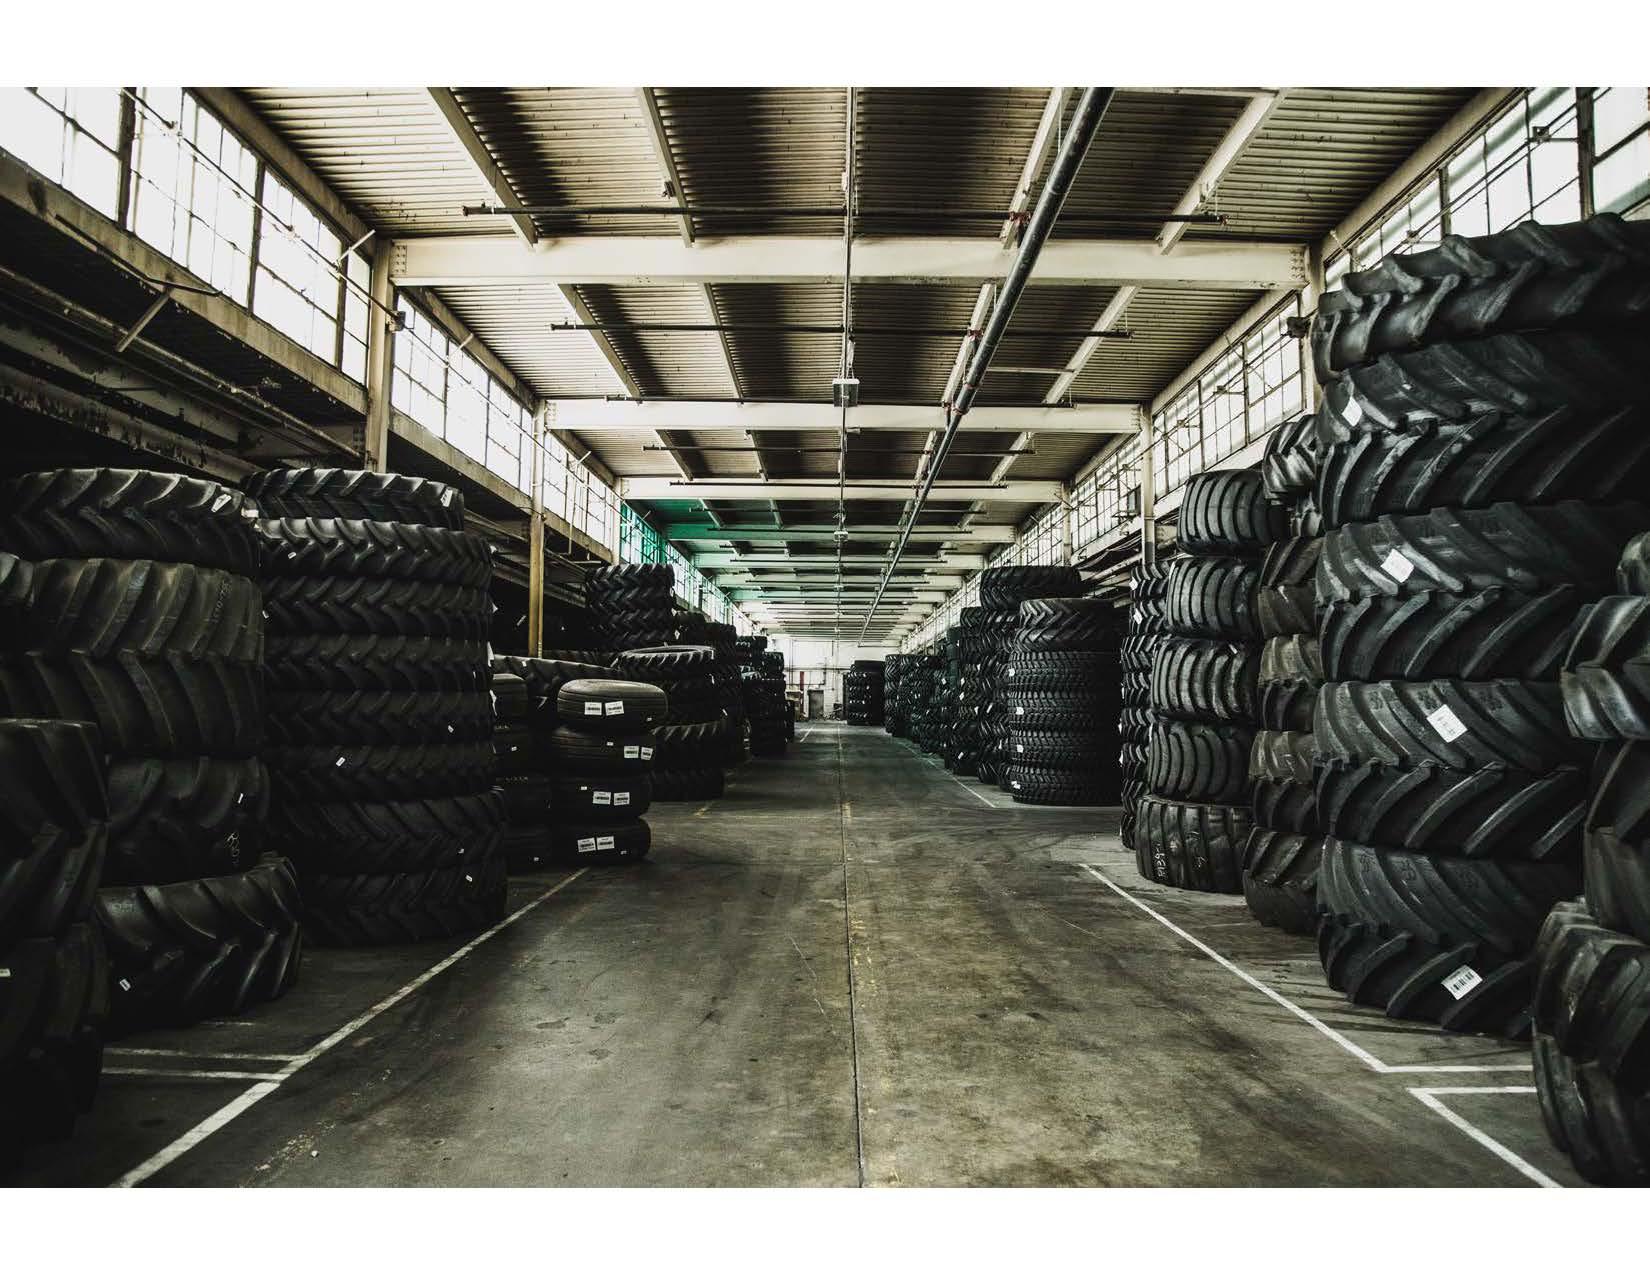 CFI Tire & Wheel image 1